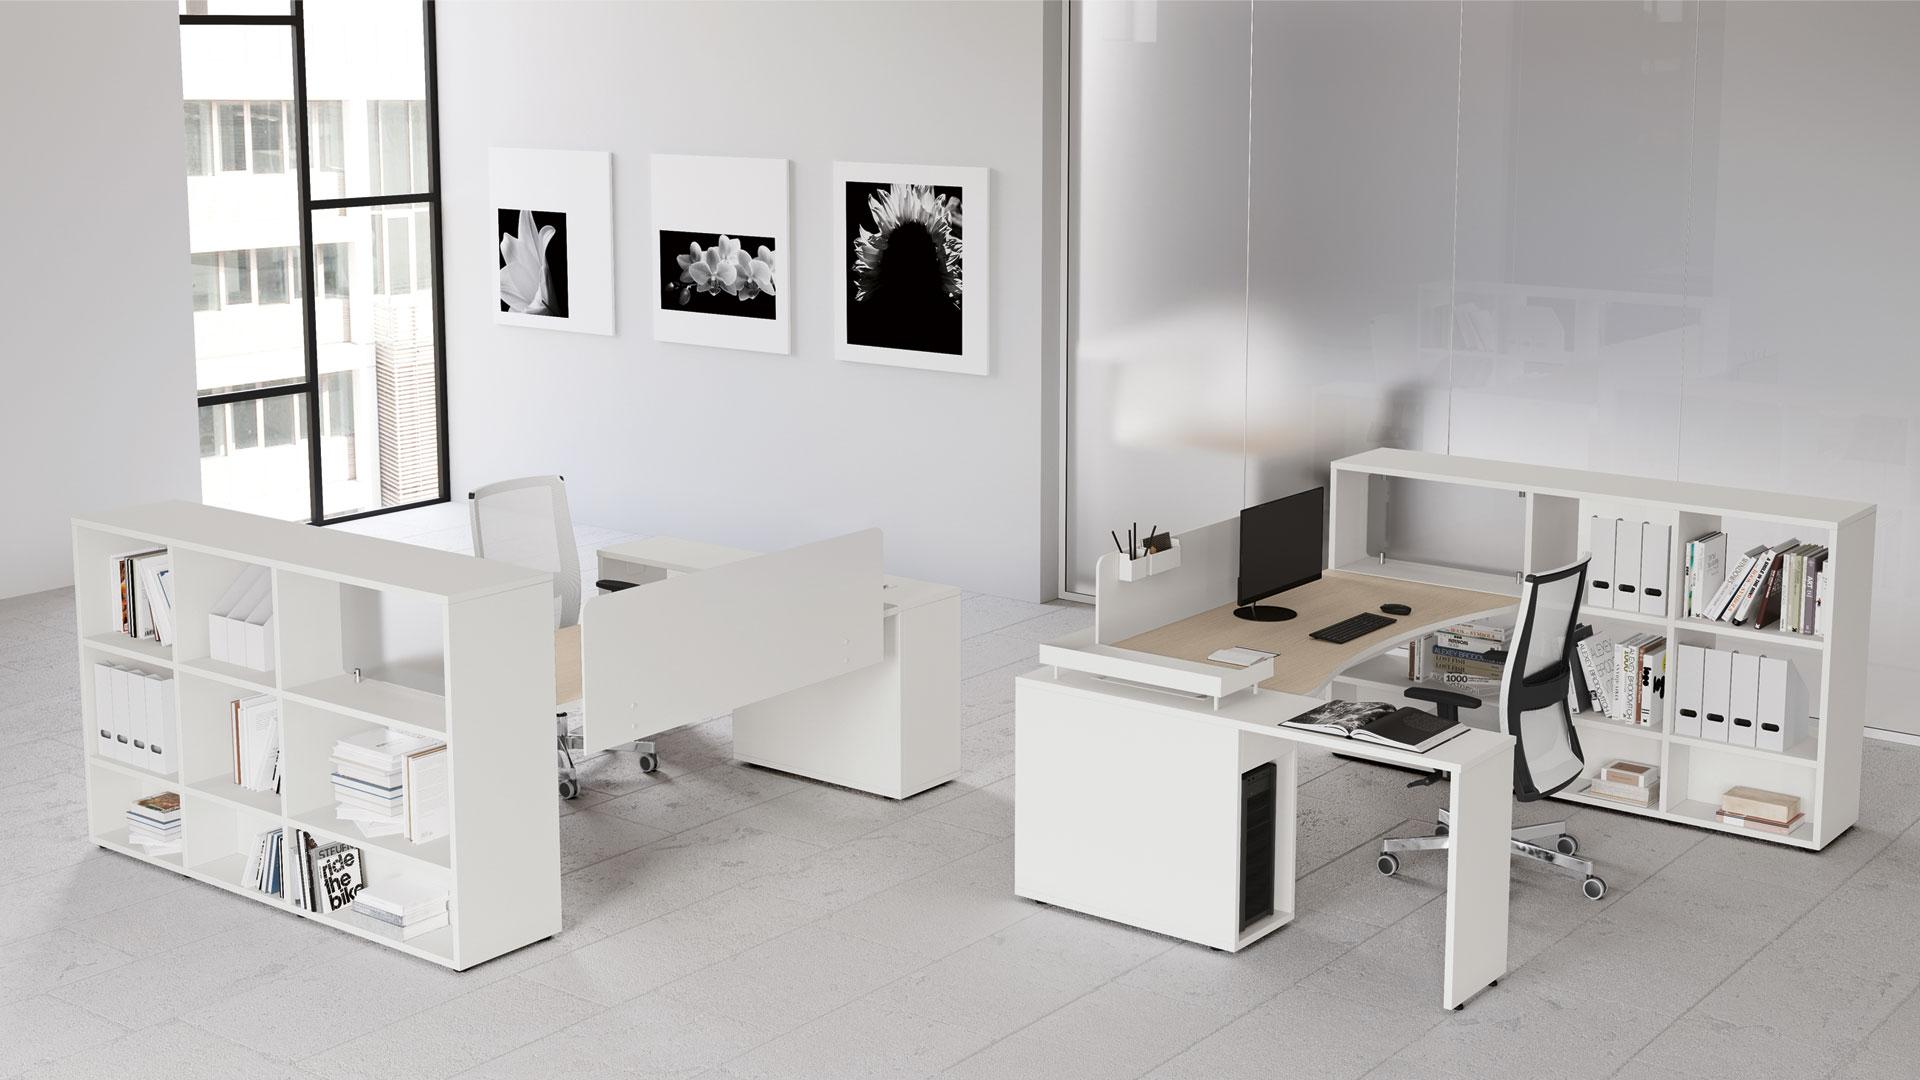 bureau logic las mobili seloma amenagement mobilier. Black Bedroom Furniture Sets. Home Design Ideas